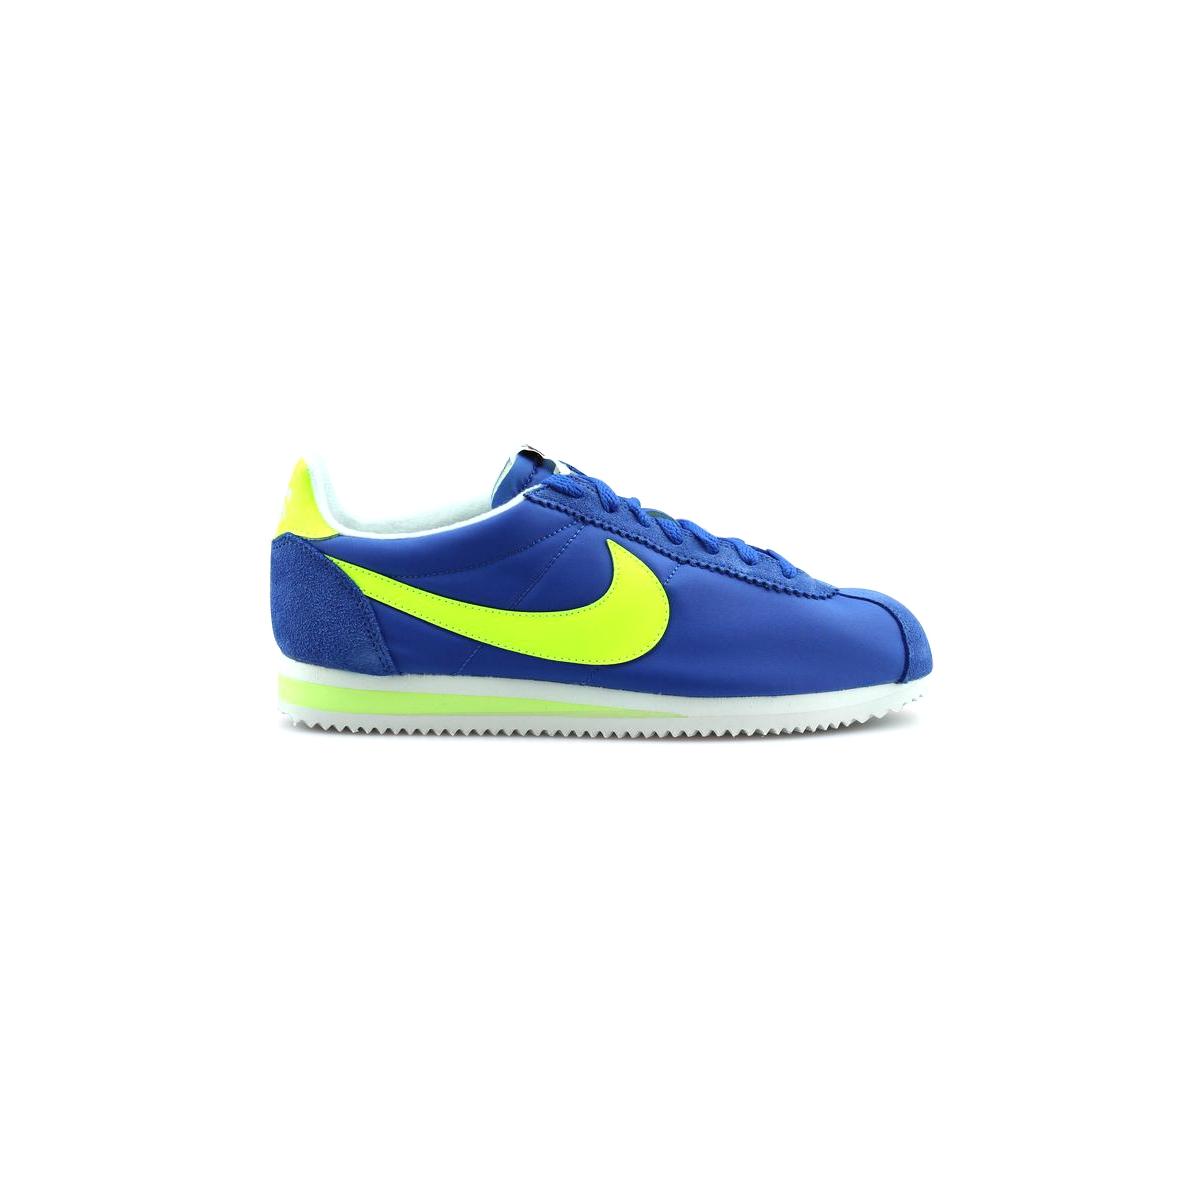 Nike Classic Cortez Nylon Aw Bleu 844855 470 43 Nike Bord